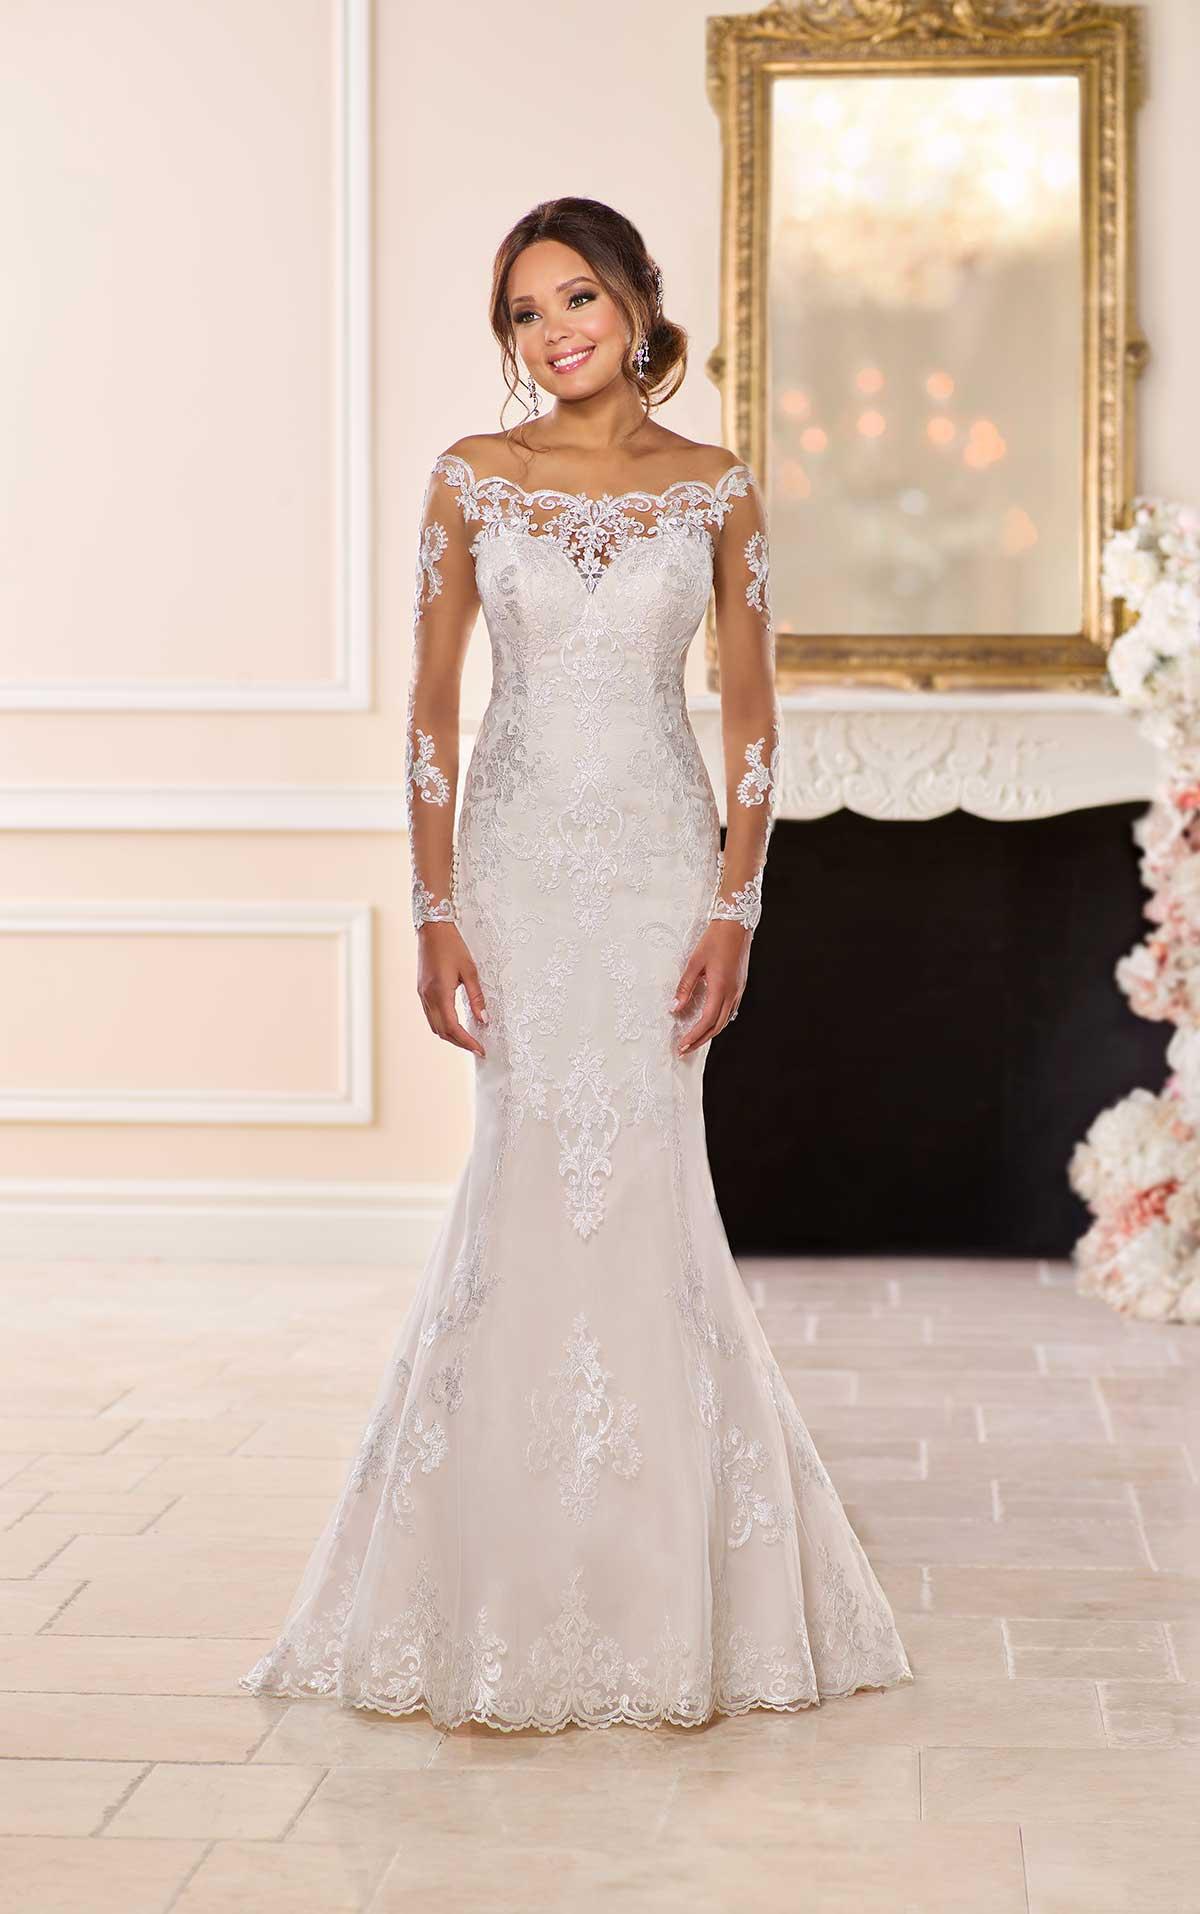 Wedding Dress Shops In Northampton Verona Couture